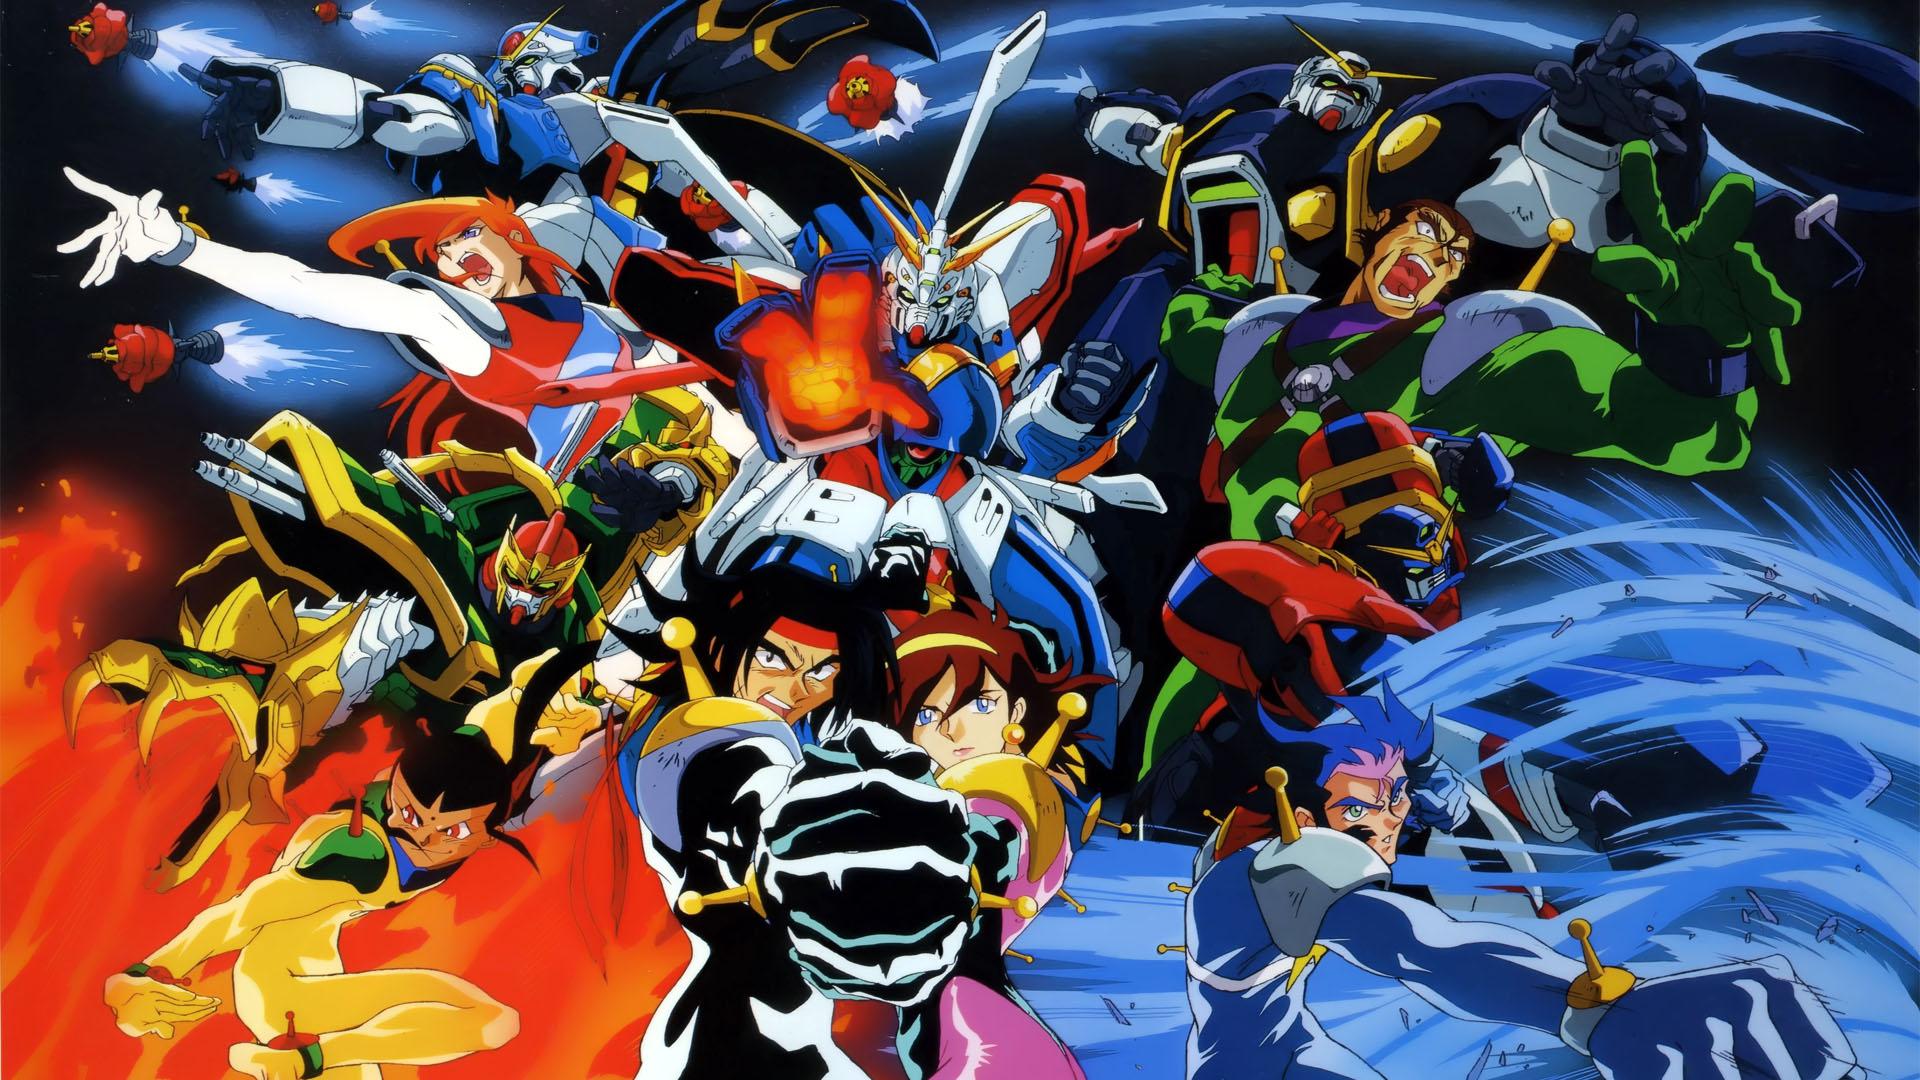 Gundam Wallpapers Gundam Backgrounds Gundam Images